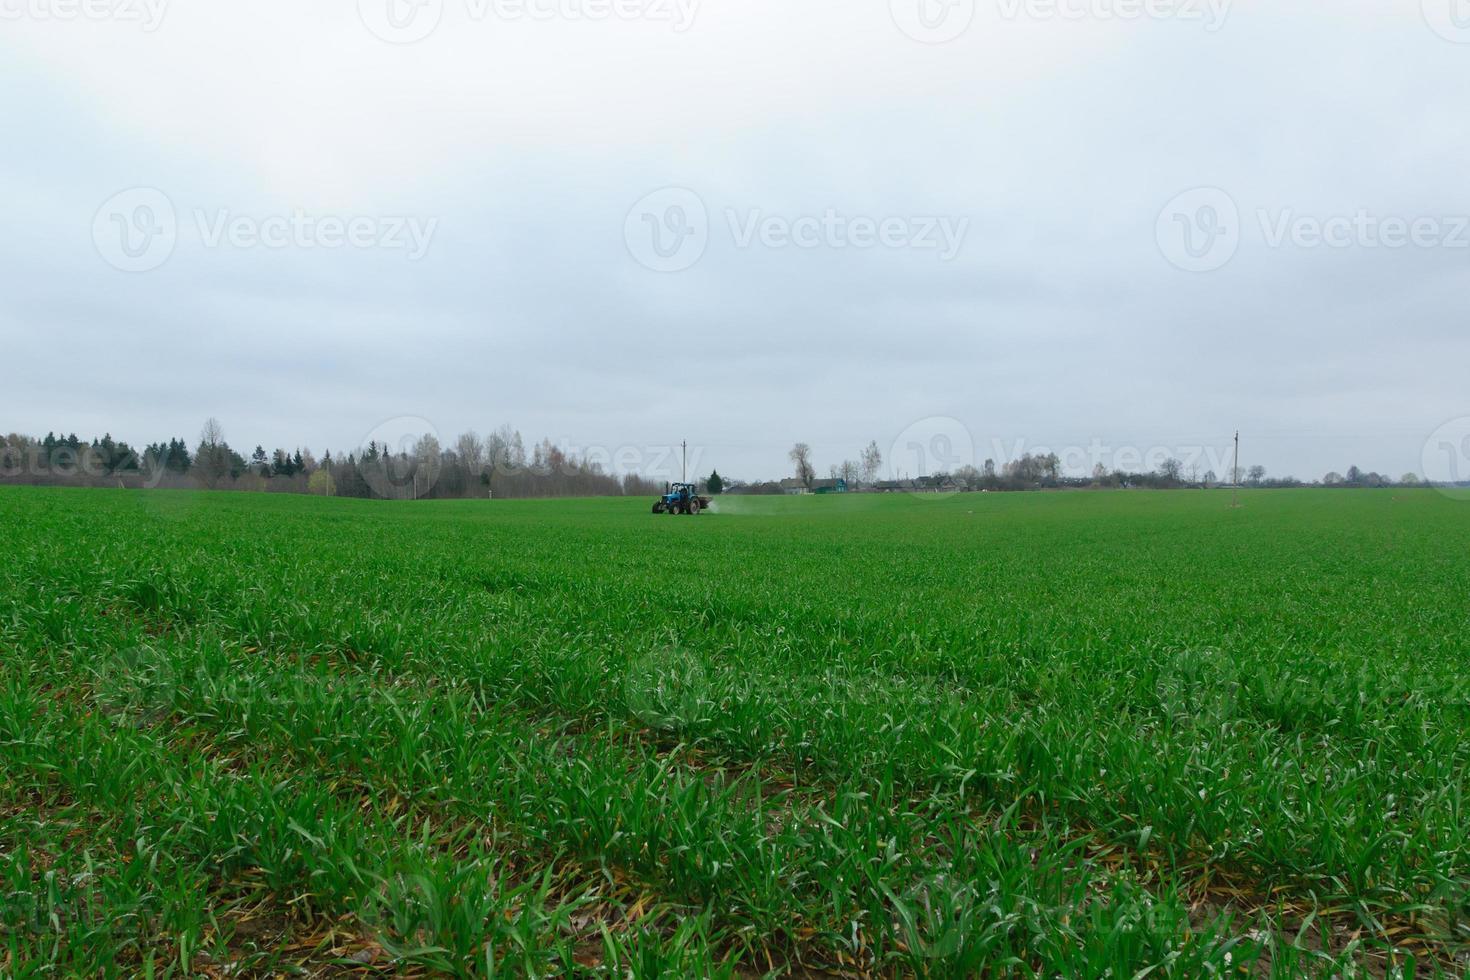 Traktor auf dem Feld foto